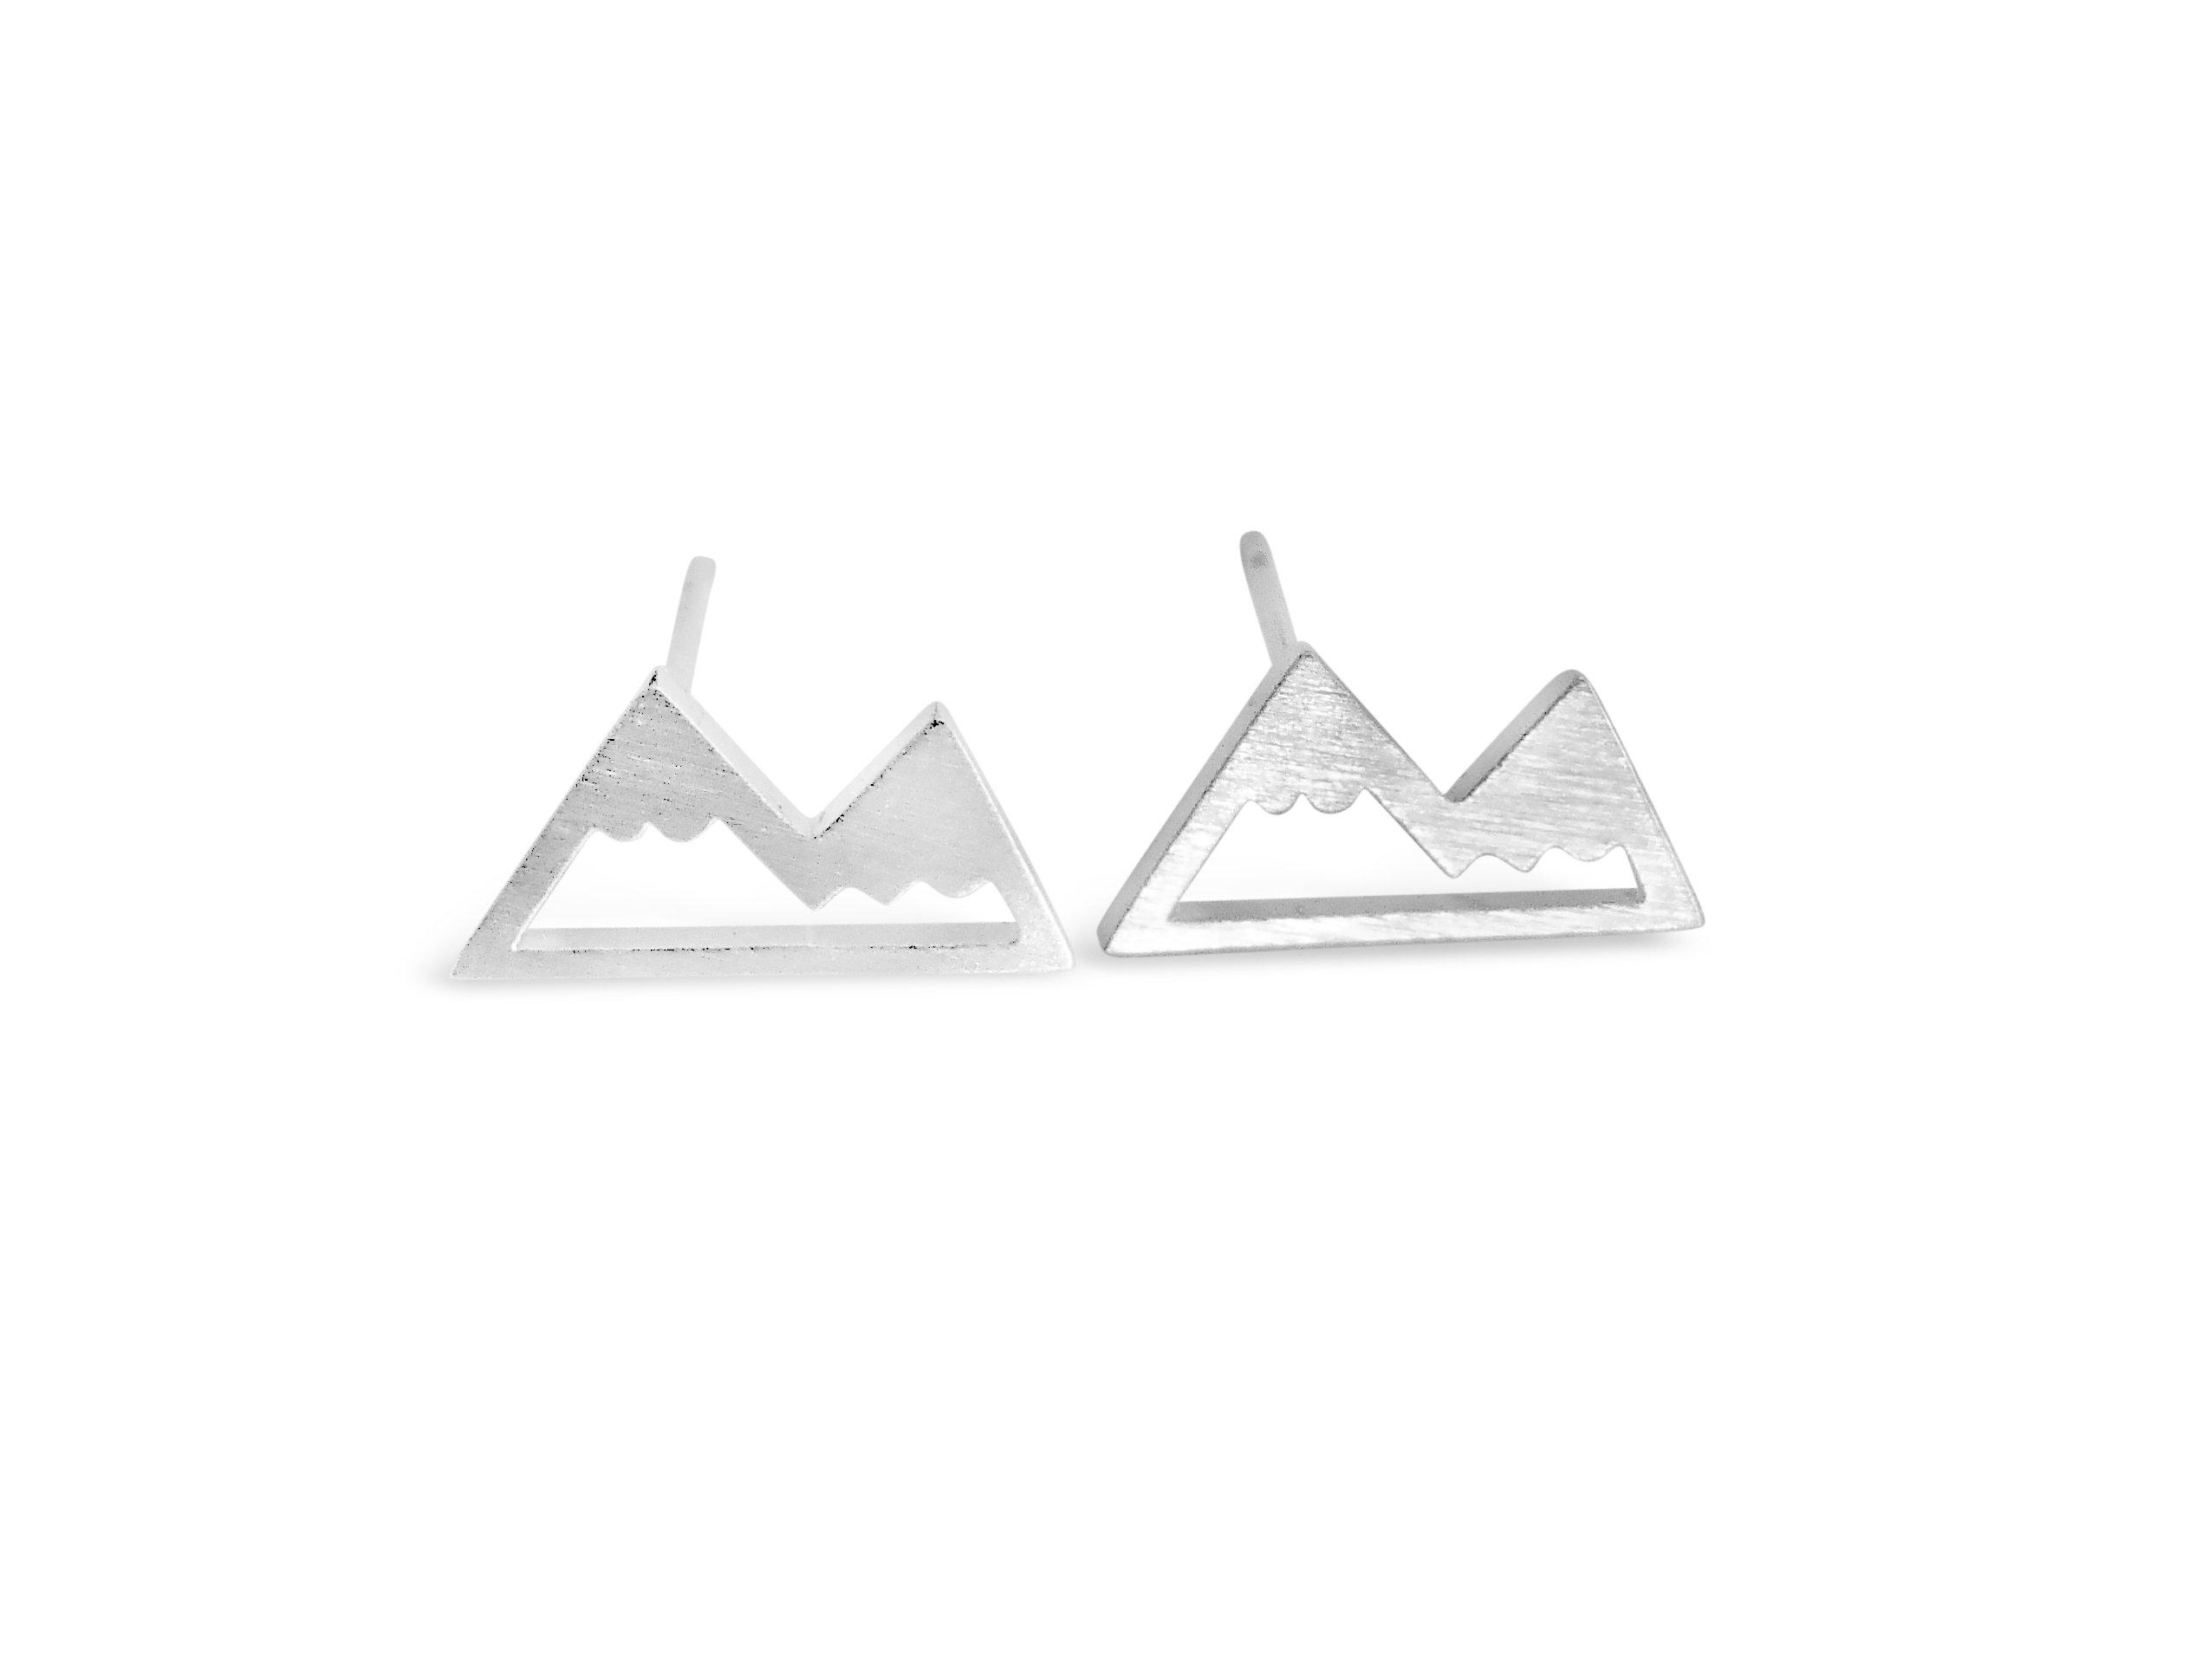 Rosa Vila Mountain Stud Earrings for Women, Outdoor Enthusiast Gifts (Silver Tone)